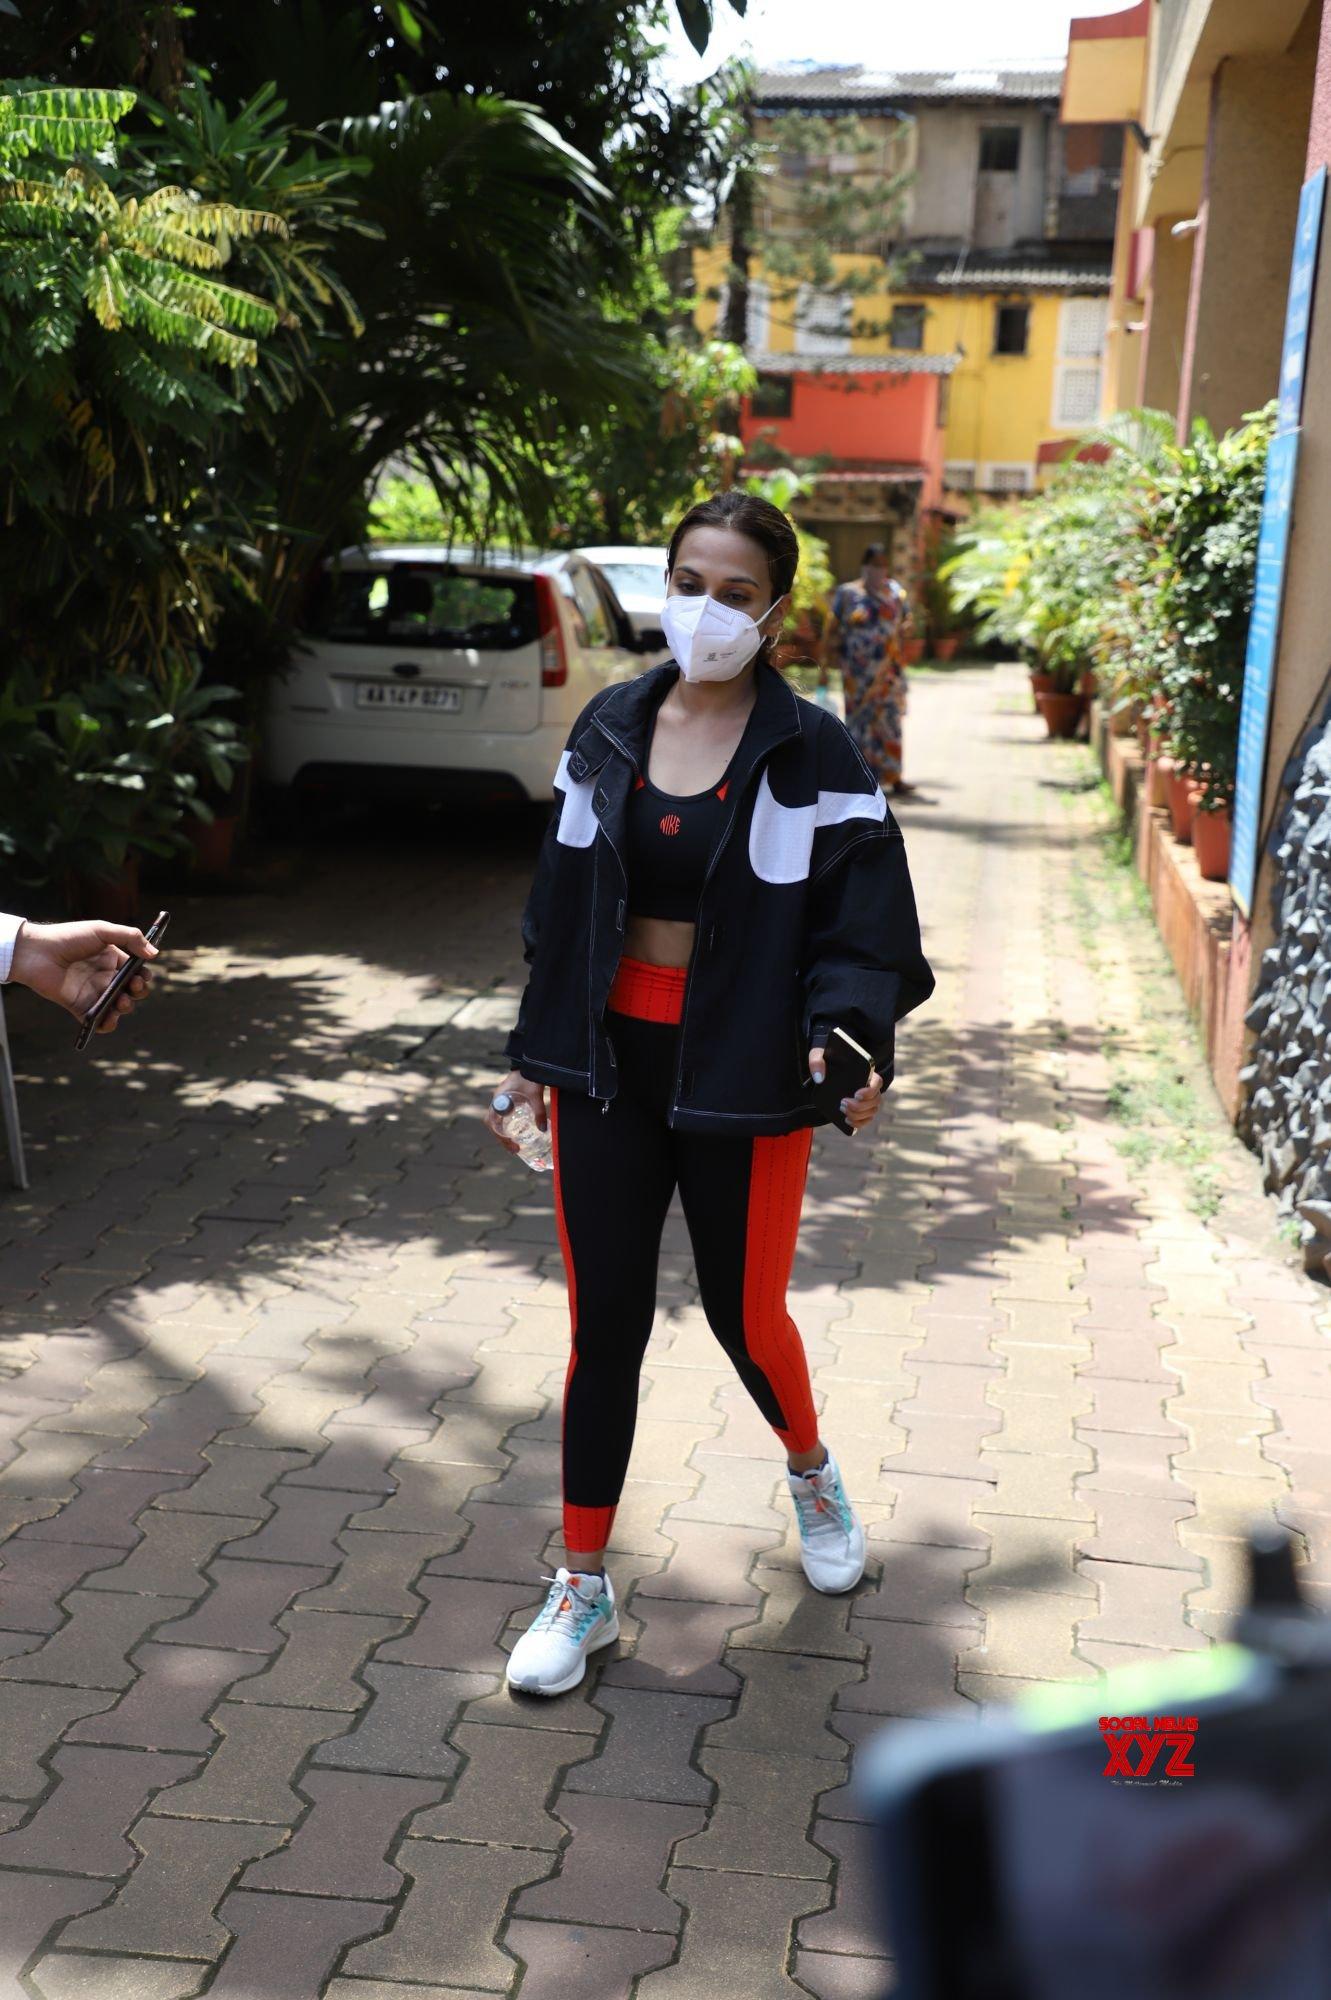 Malaika Arora And Rajinikanth Daughter Aishwarya Spotted Outside Diva Yoga In Bandra - Gallery